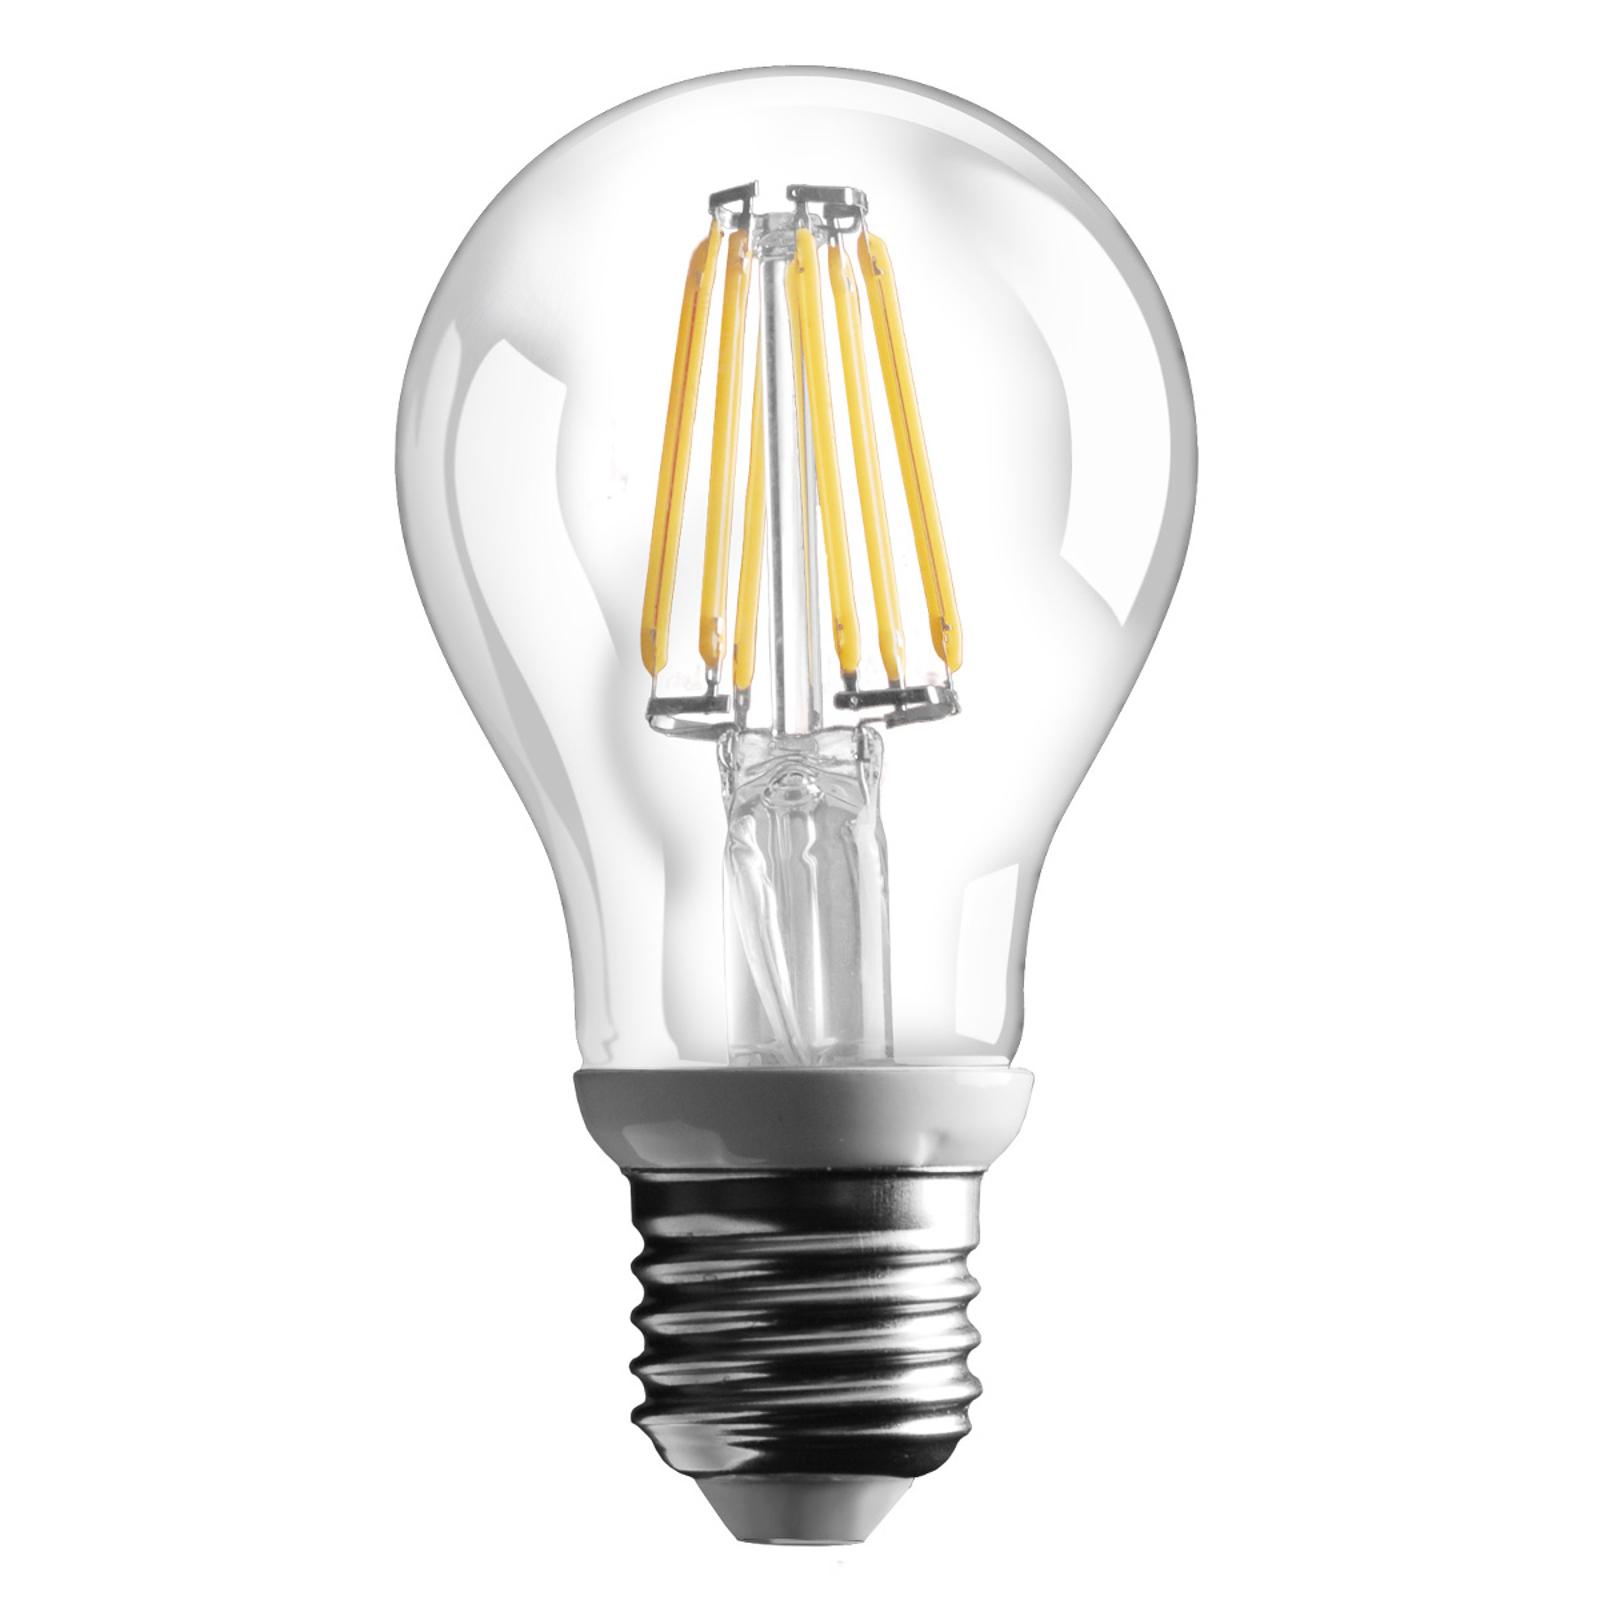 E27 6W filament LED bulb with 800 lm, warm white_3538053_1